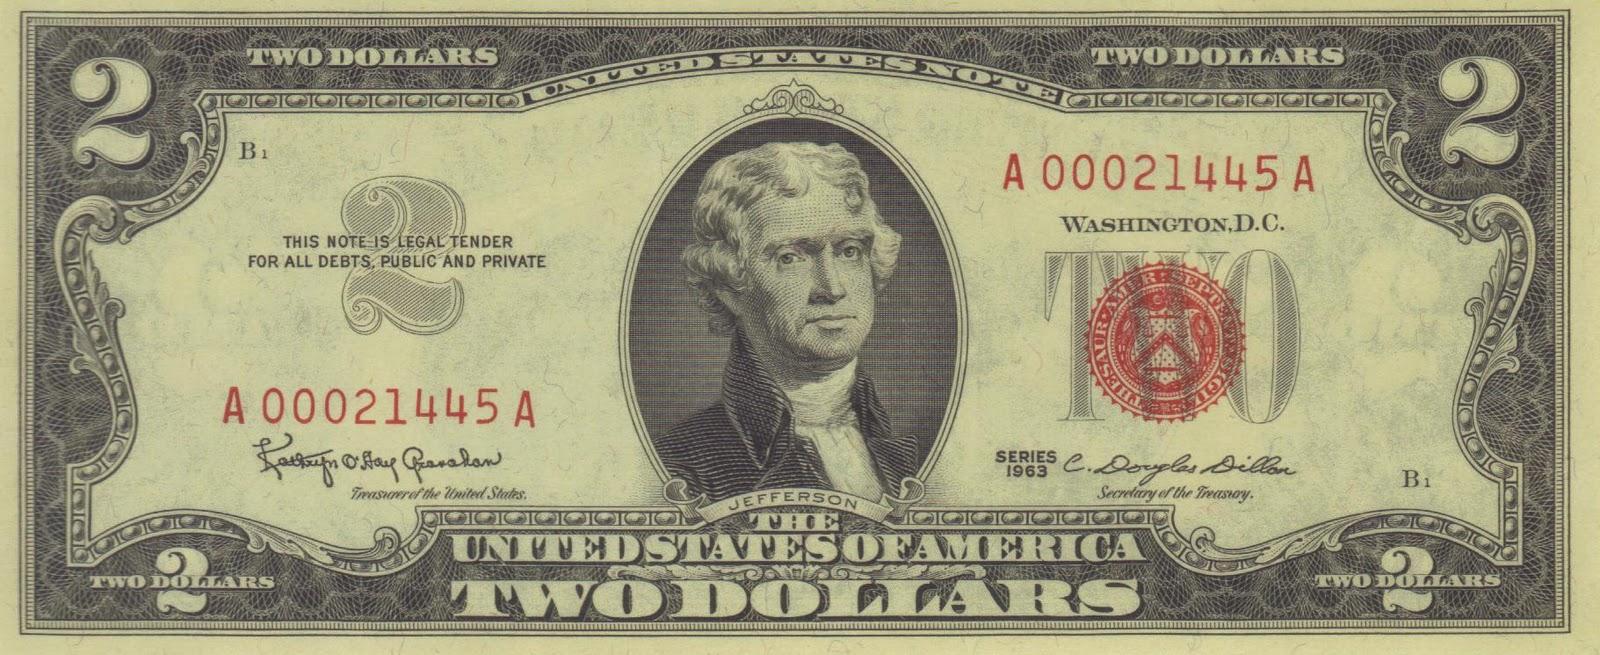 News man jfk was killed for printing these united states notes saturday november 19 2011 xflitez Choice Image